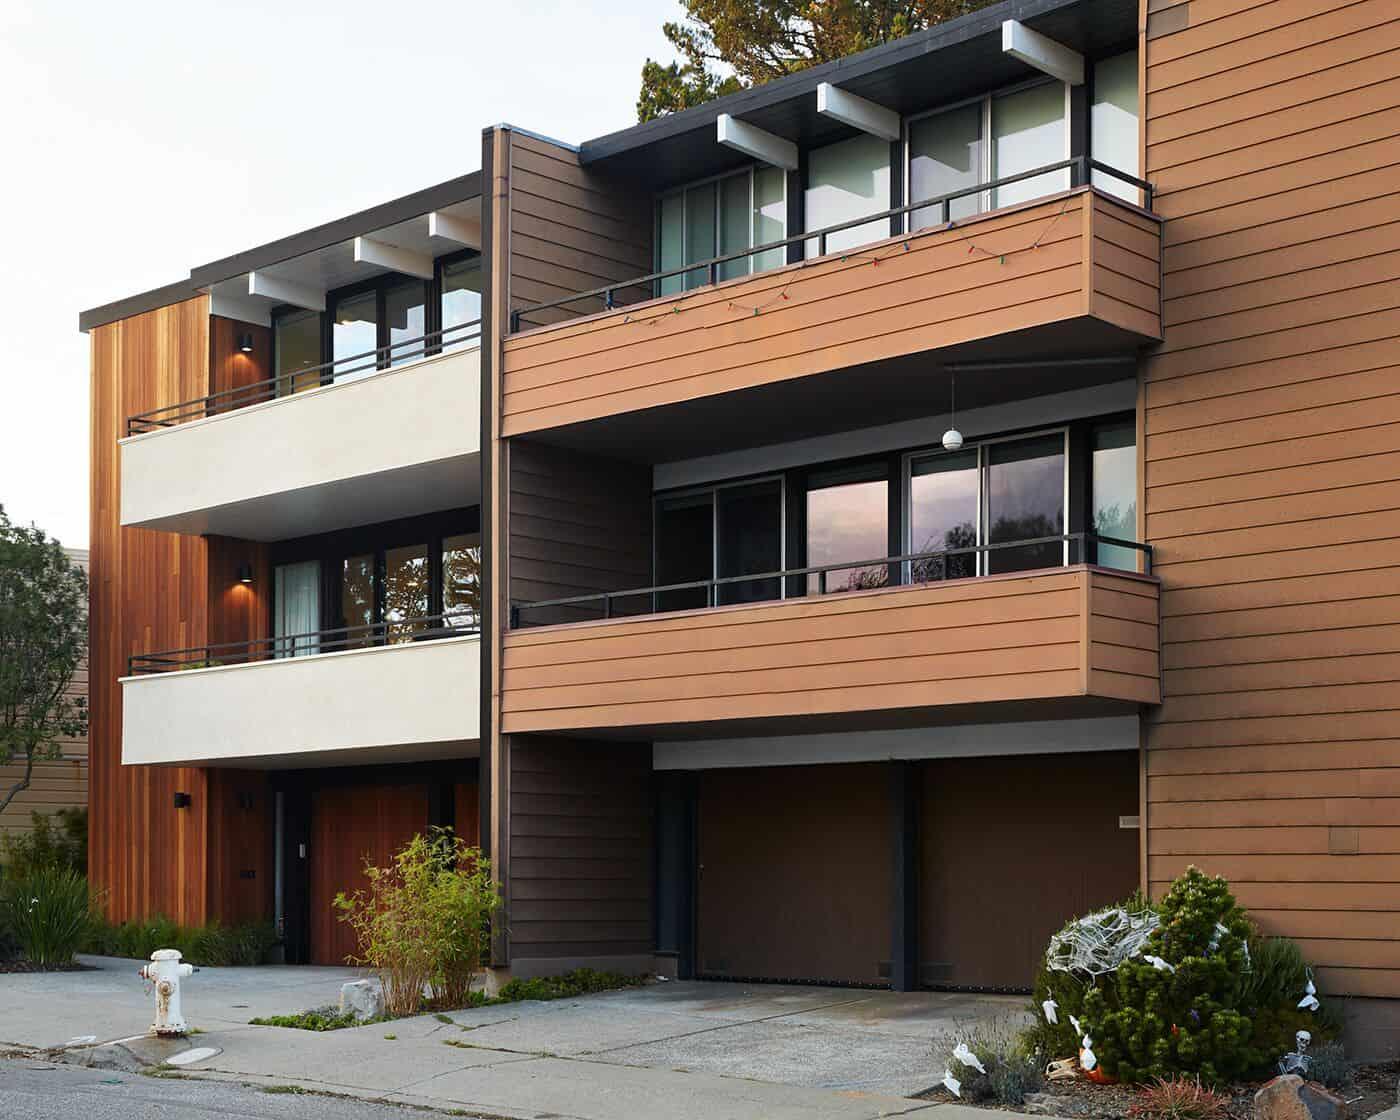 San Francisco Eichler Remodel-Klopf Architecture-19-1 Kindesign